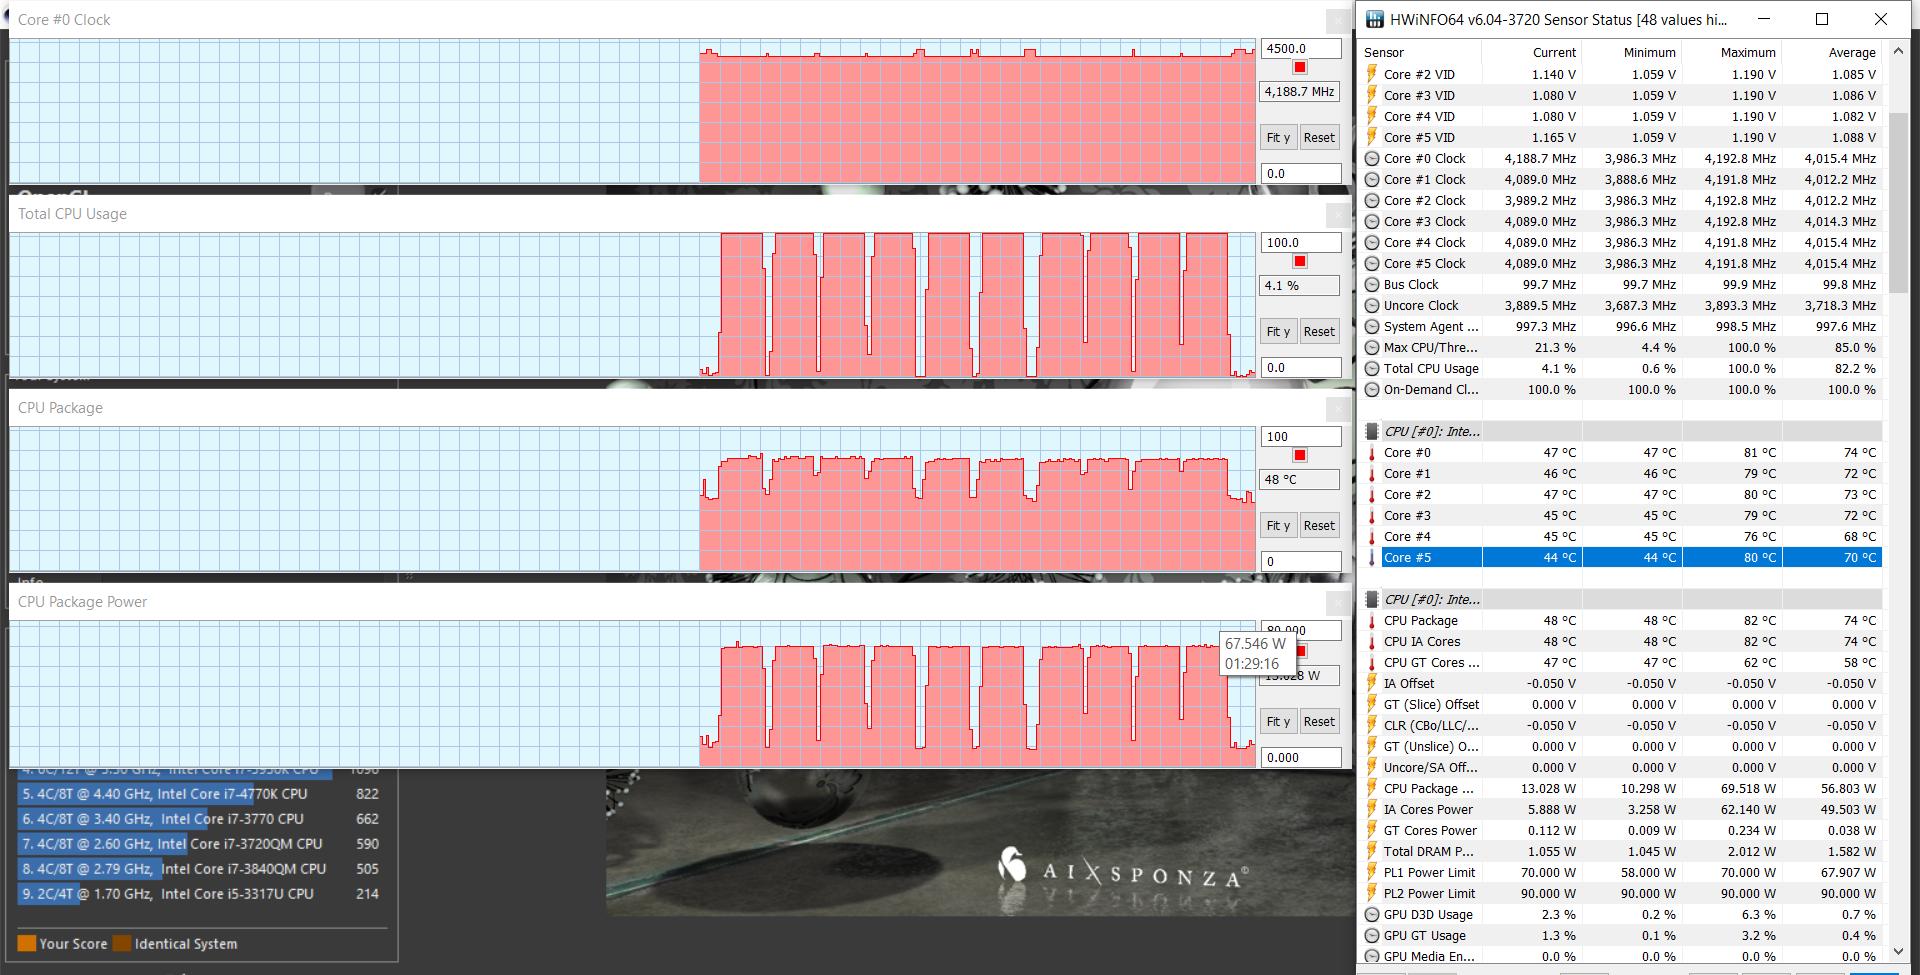 Intel Core i7-9750H laptop processor benchmarks, vs i7-8750H